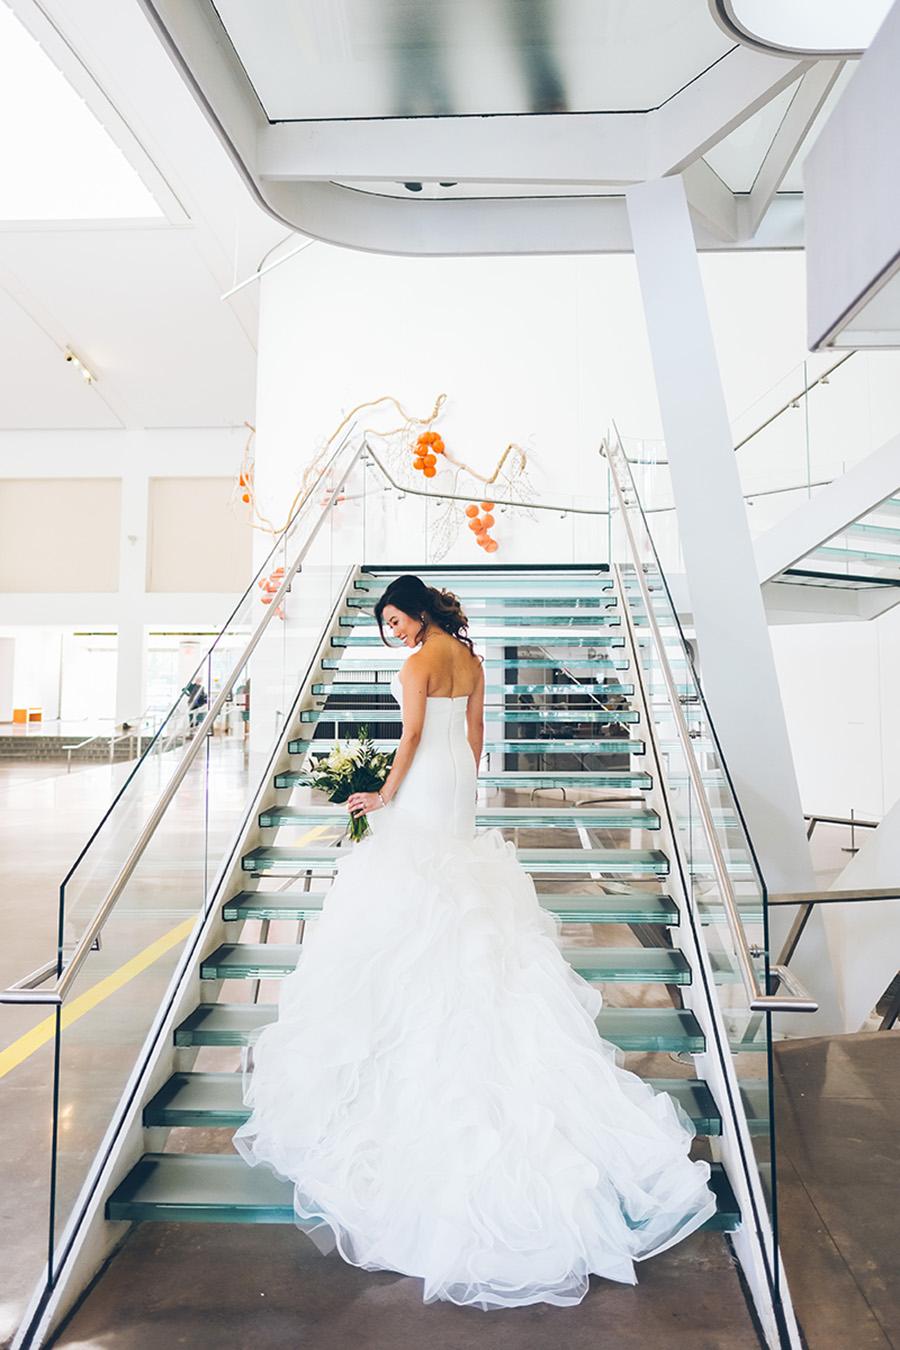 JUDITH-IRVING-NYC-WEDDING-BRIDEGROOM-CYNTHIACHUNG-0143.jpg